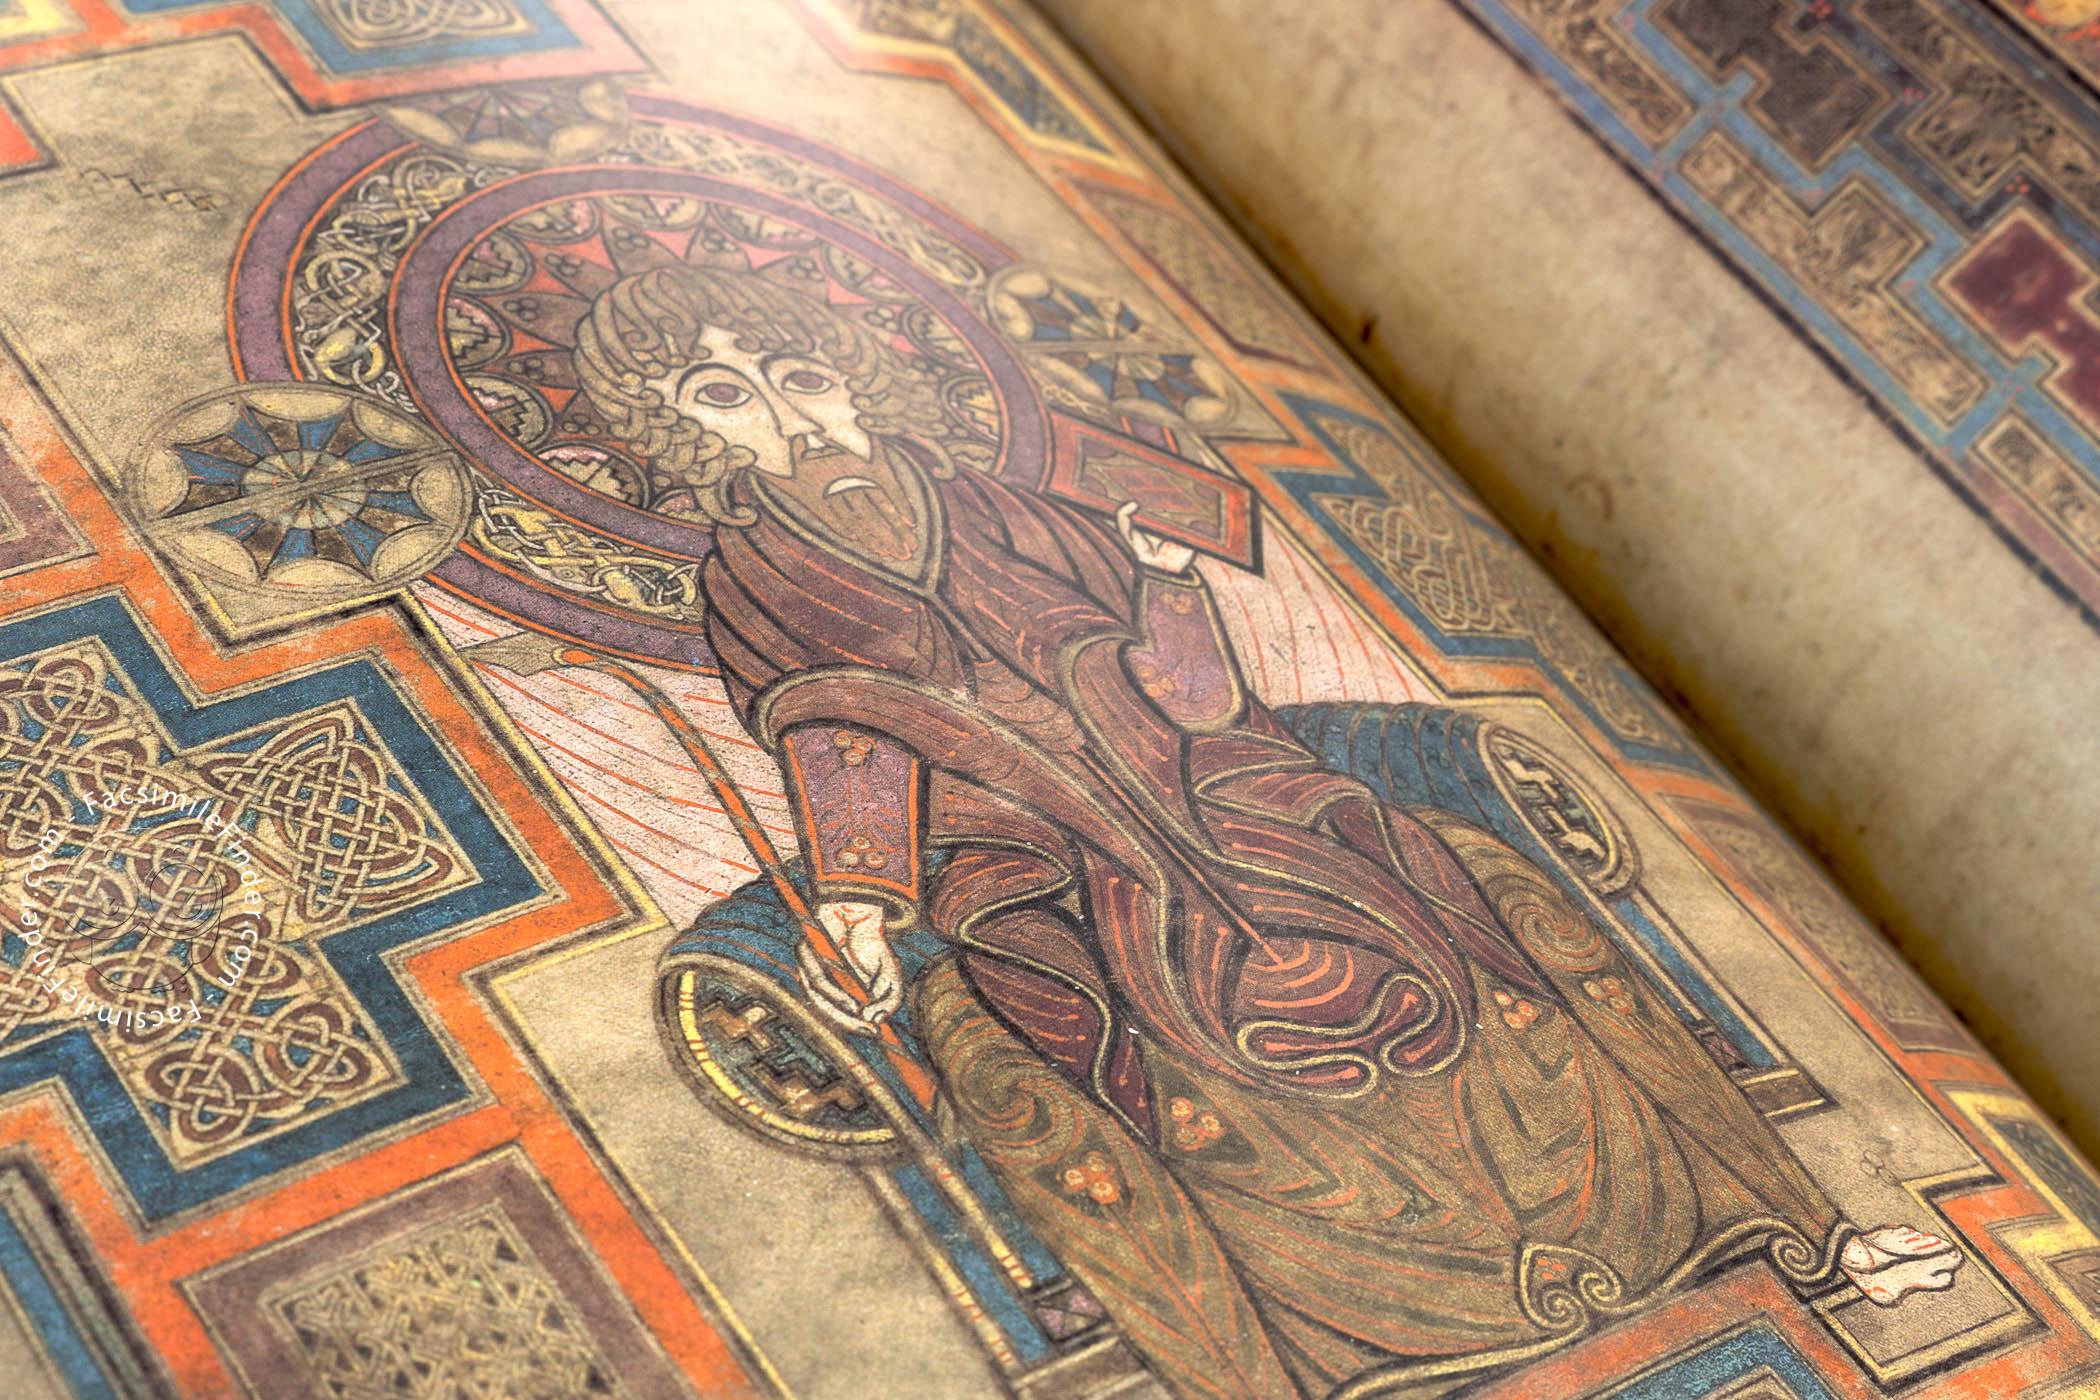 Book Of Kells Facsimile Edition